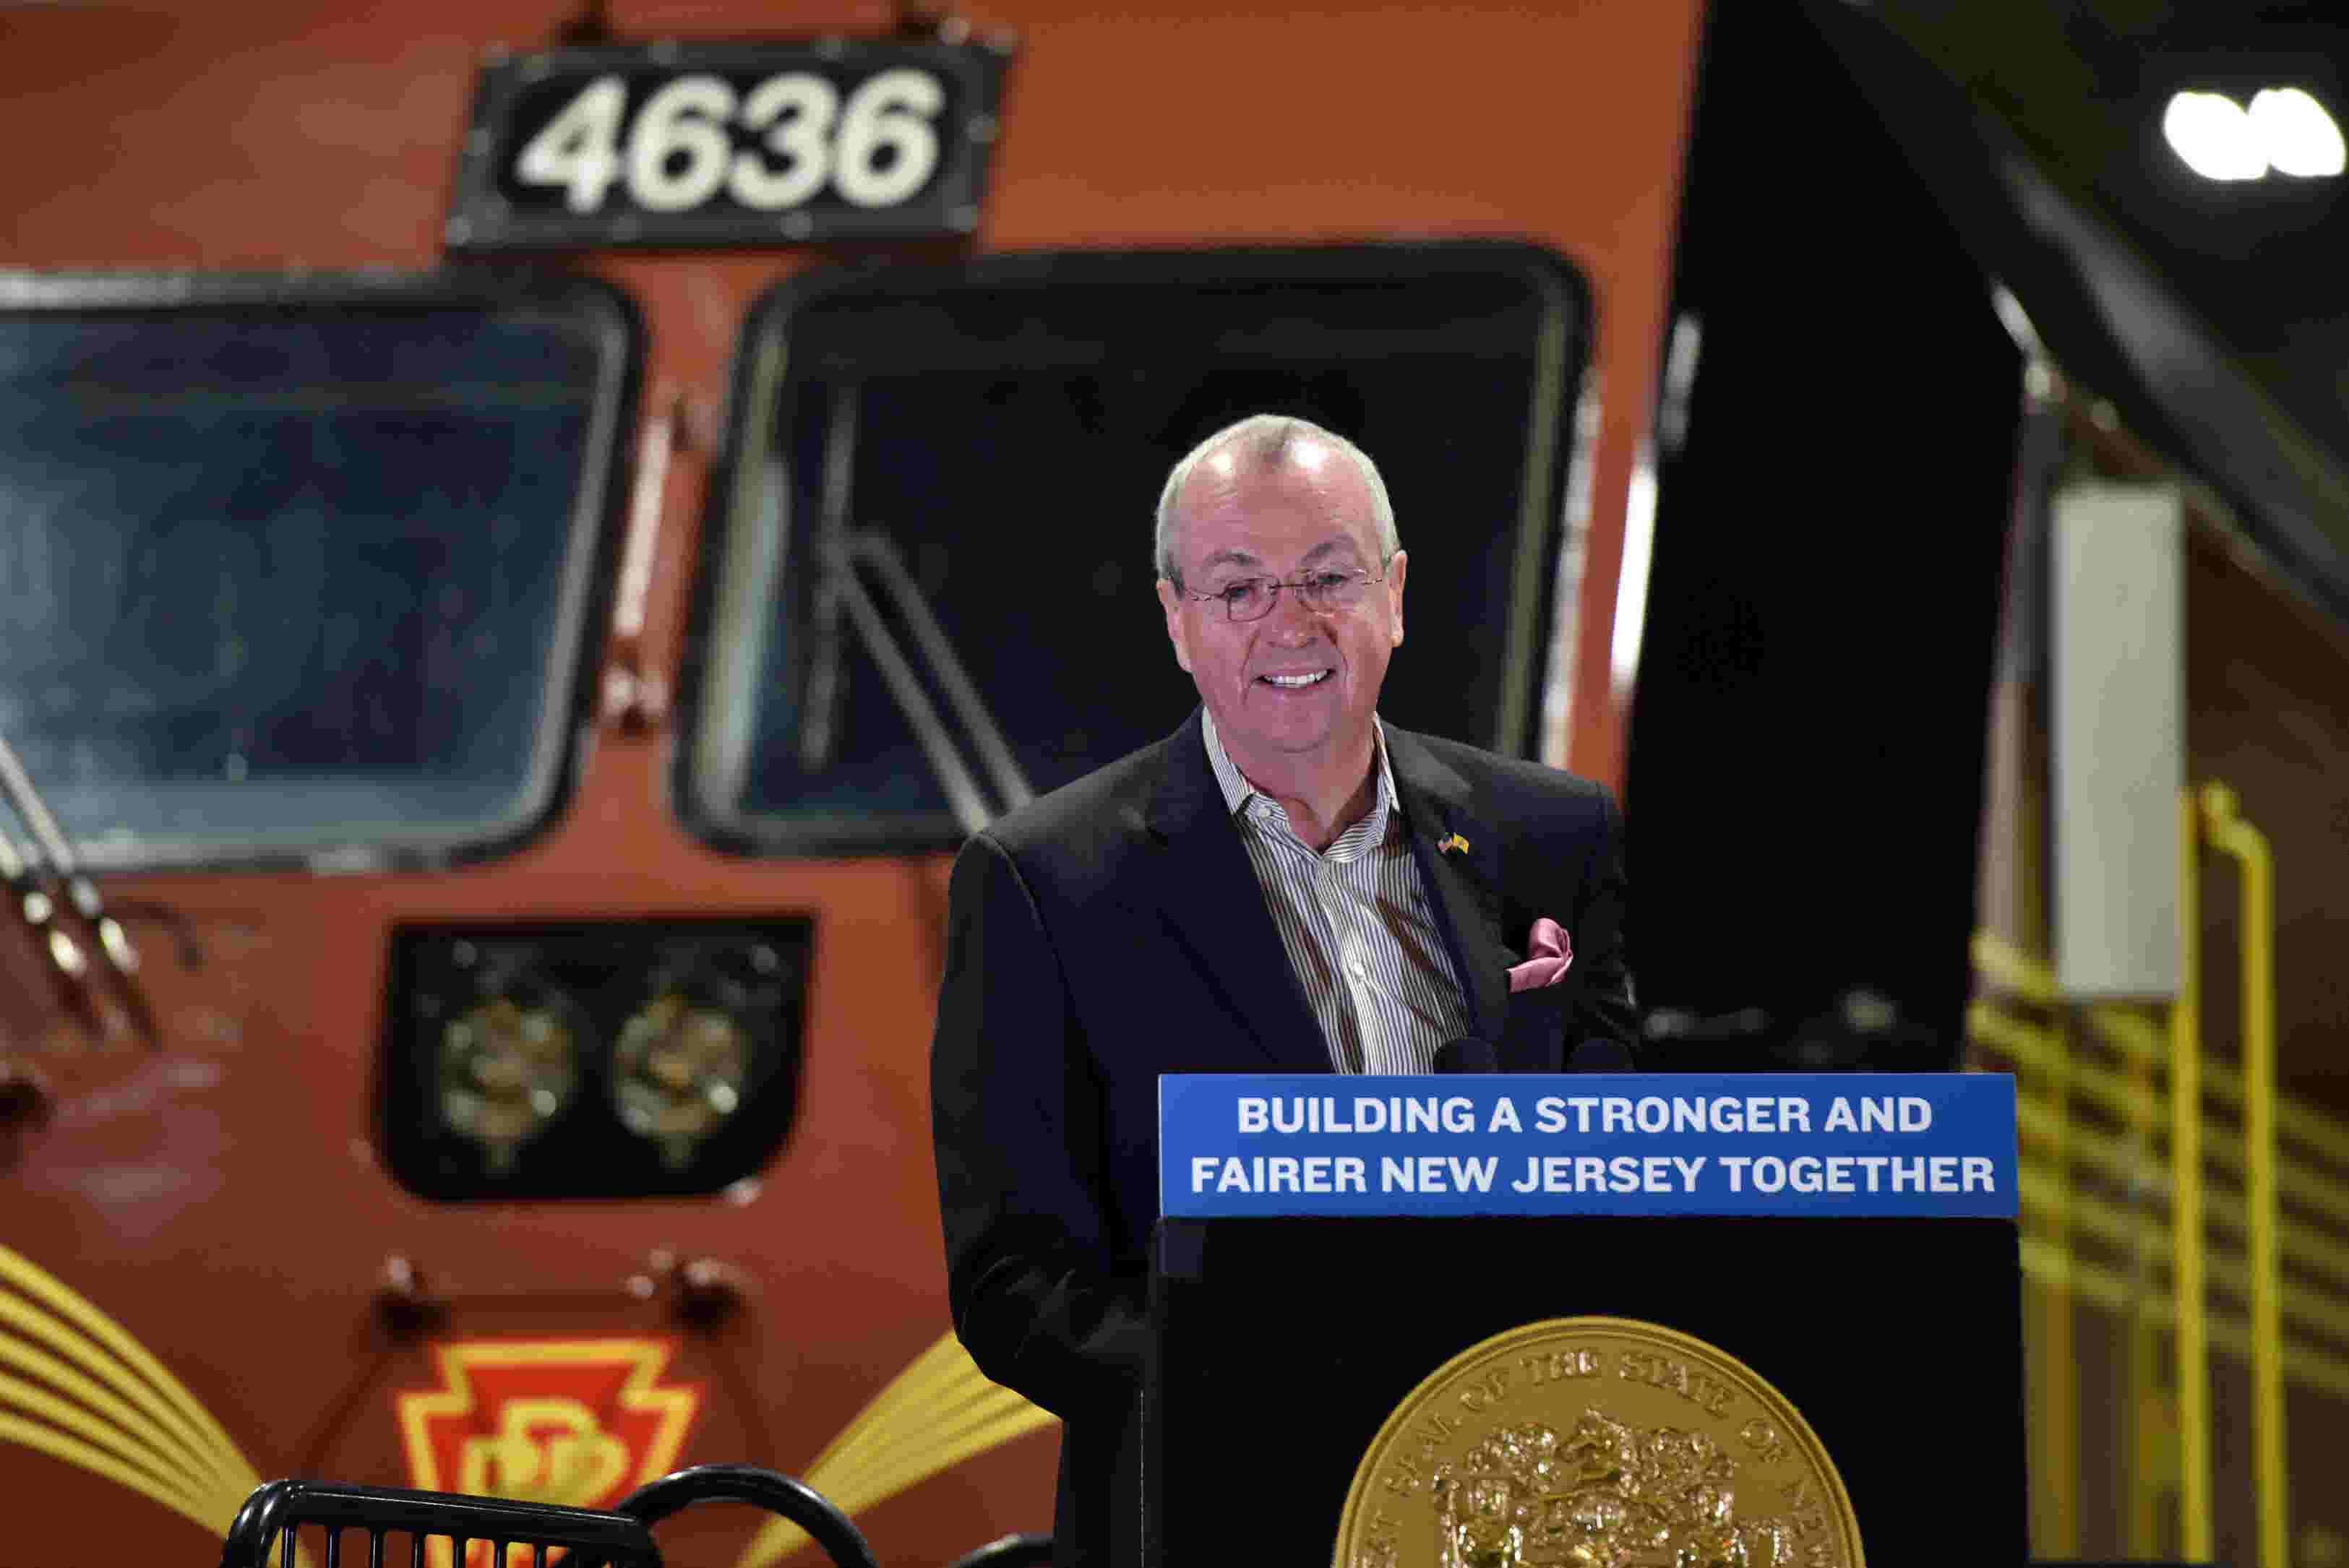 NJ Transit creates real estate chief role to generate revenue through holdings